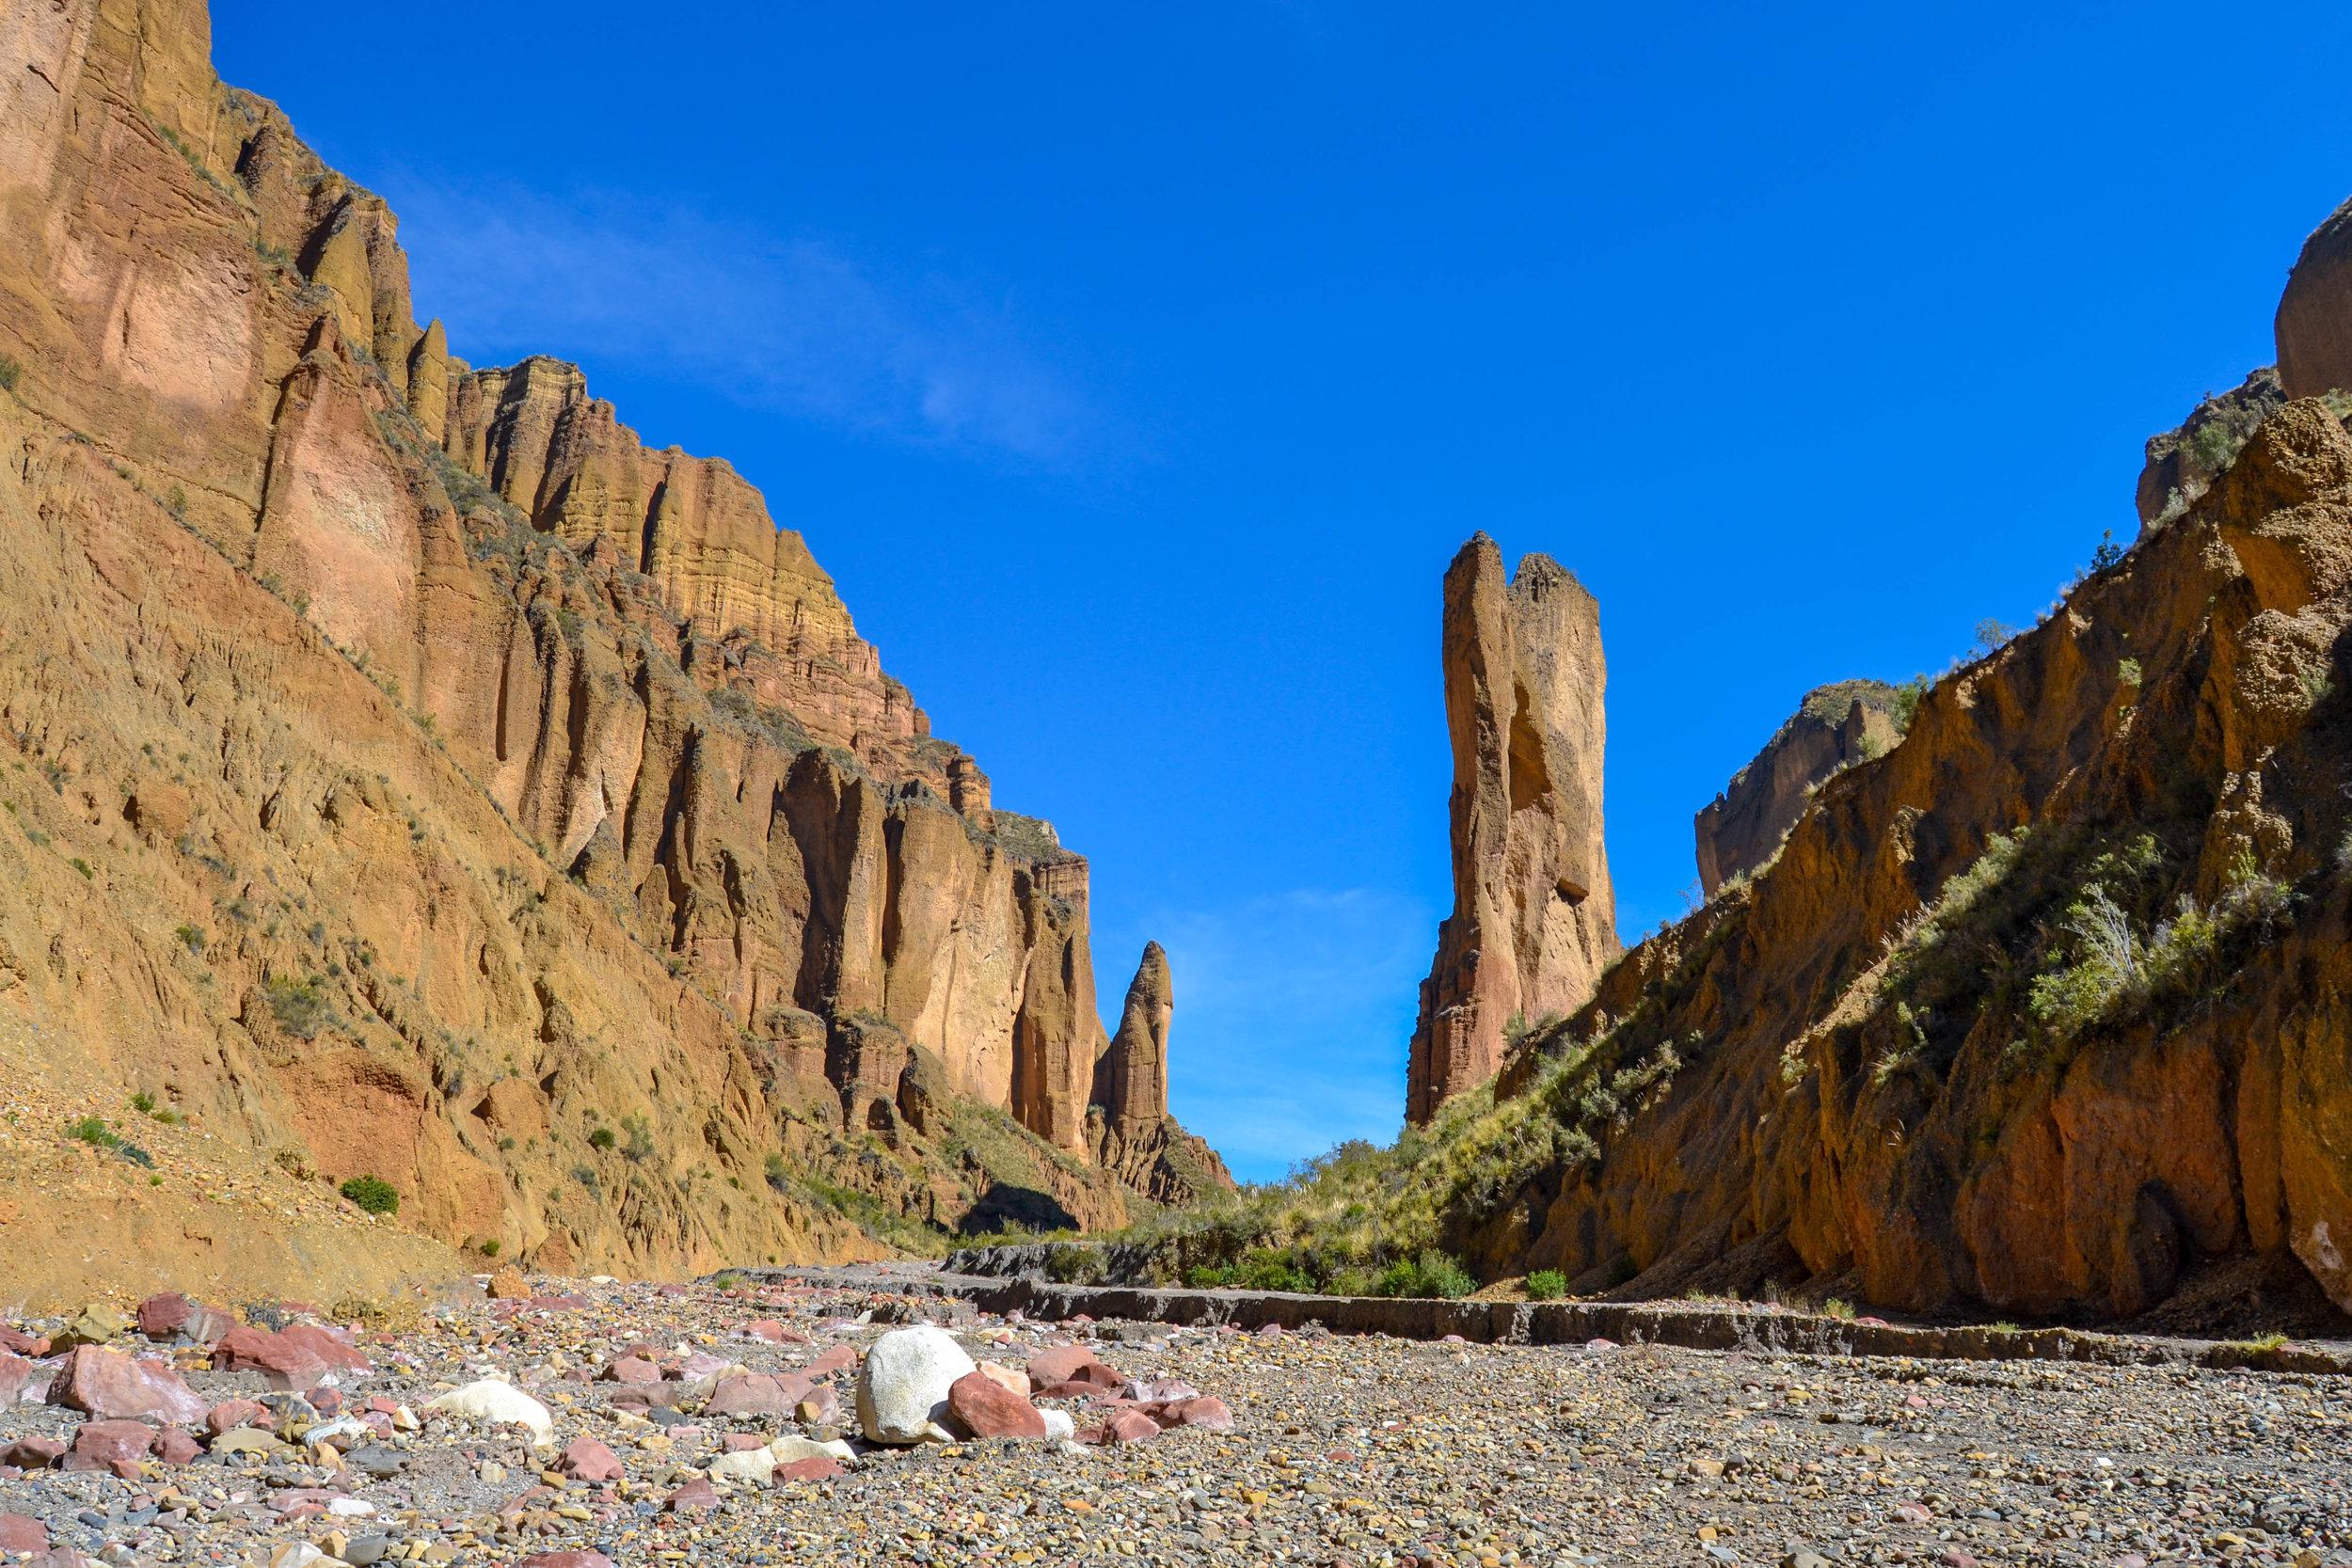 Palca Canyon Rock Tower